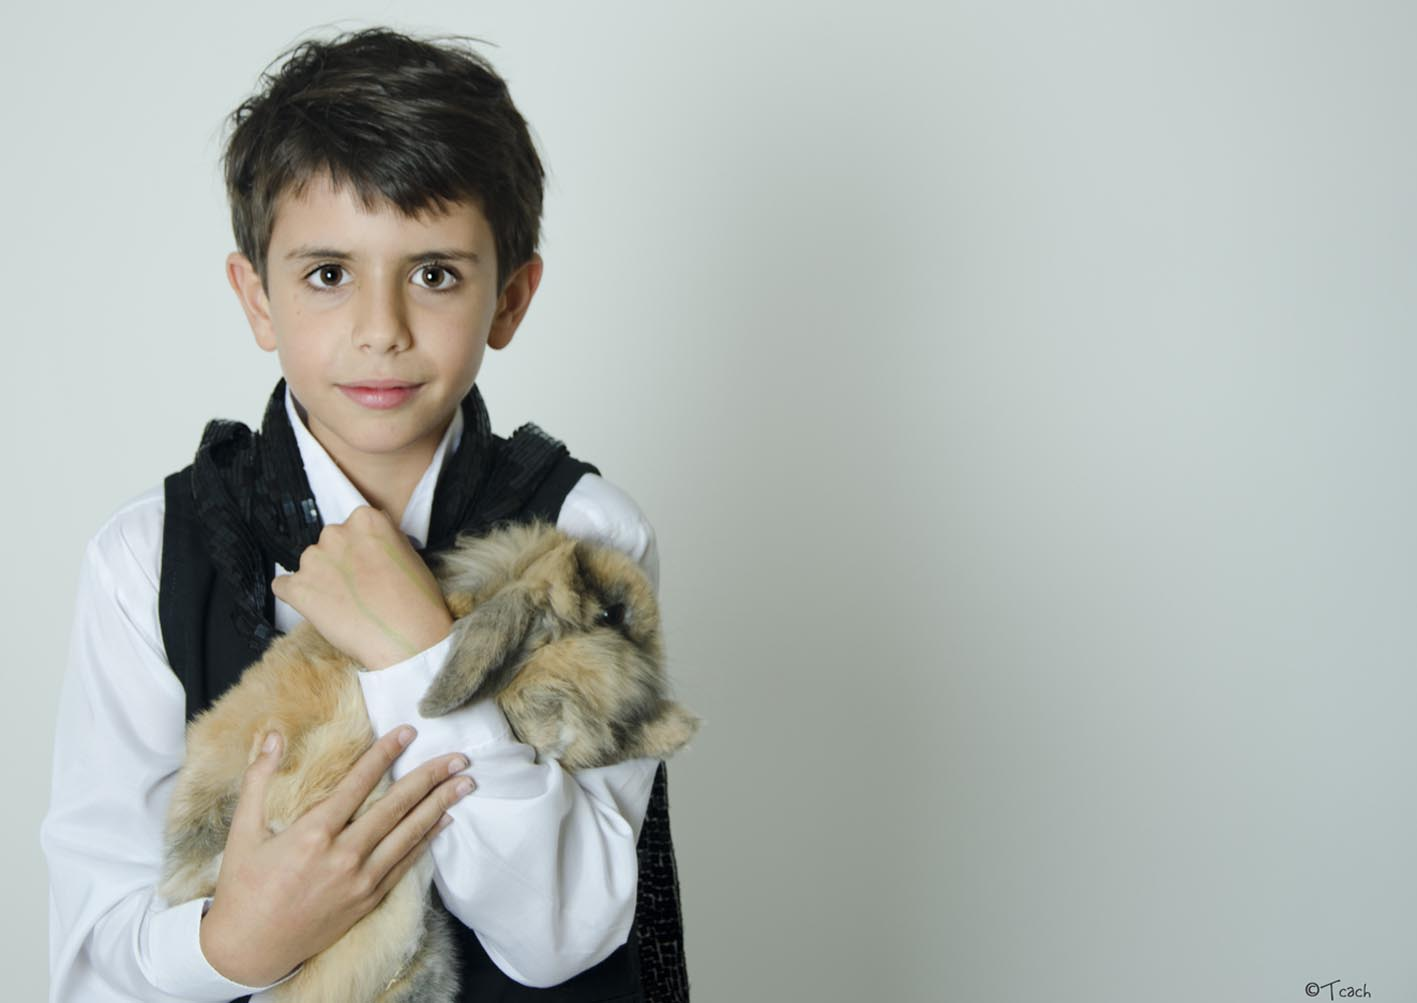 fotos de niños guapos | TCACH FOTOGRAFIAS